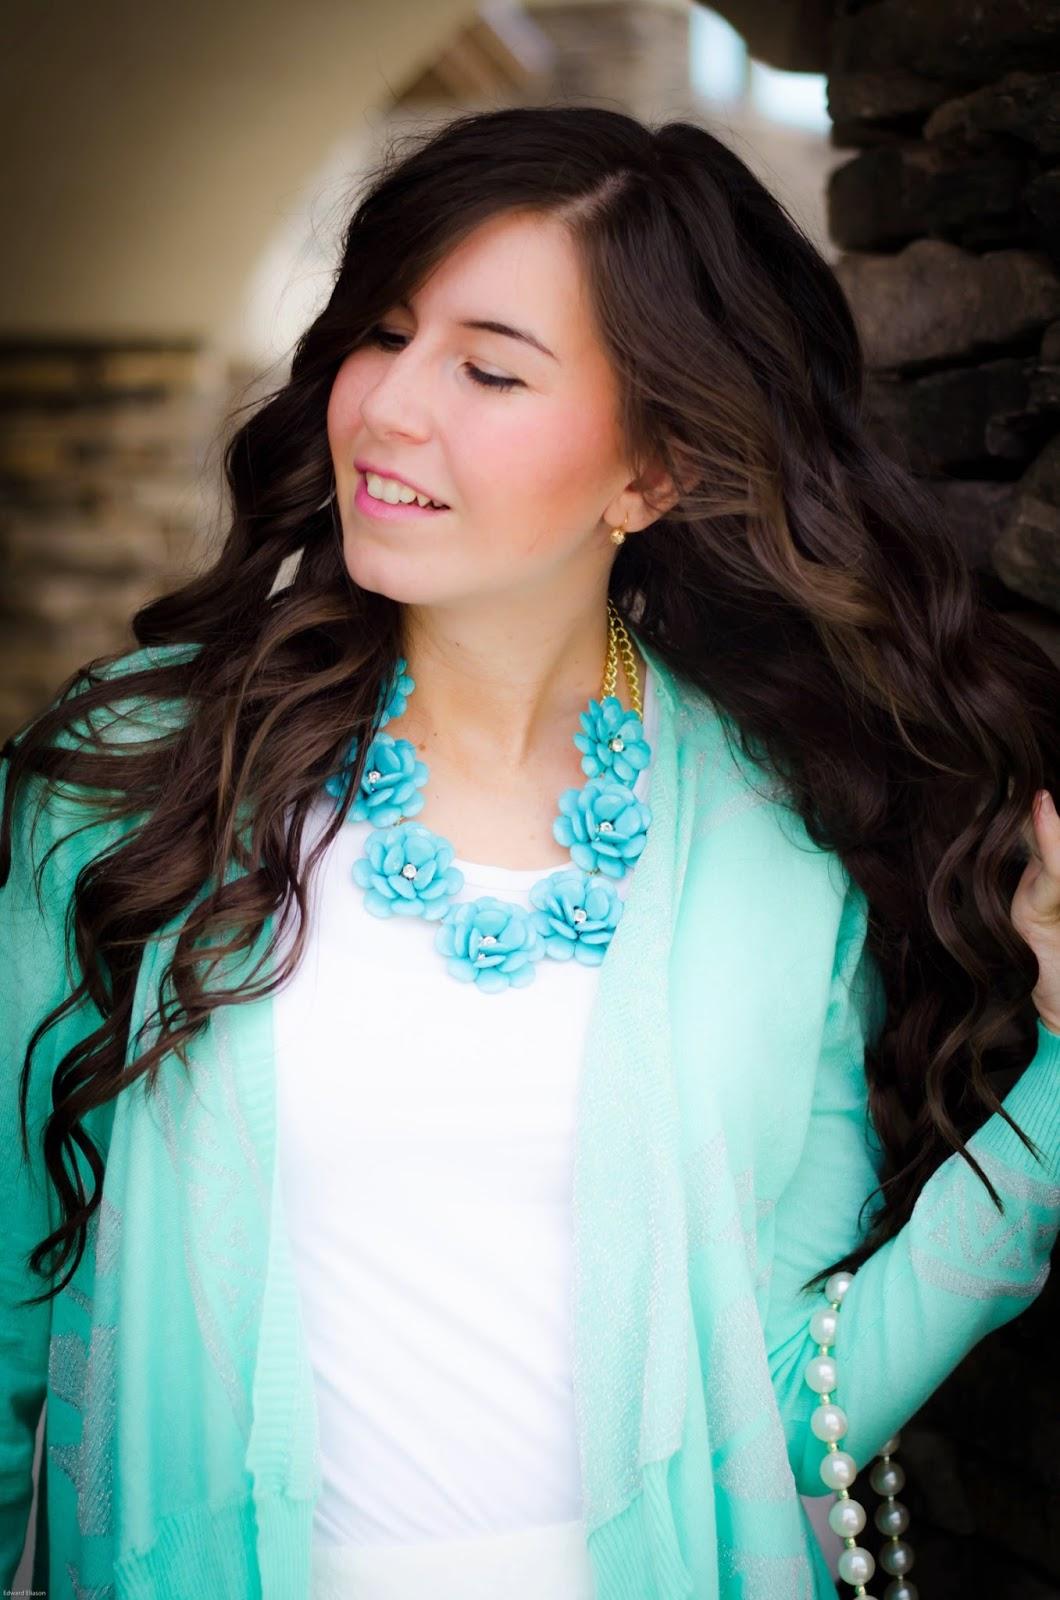 mint floral necklace, 7 piece flower necklace, mint necklace, mint necklace outfit, mint on mint, mint necklace with flowers, mint aztec cardigan, floral necklace,